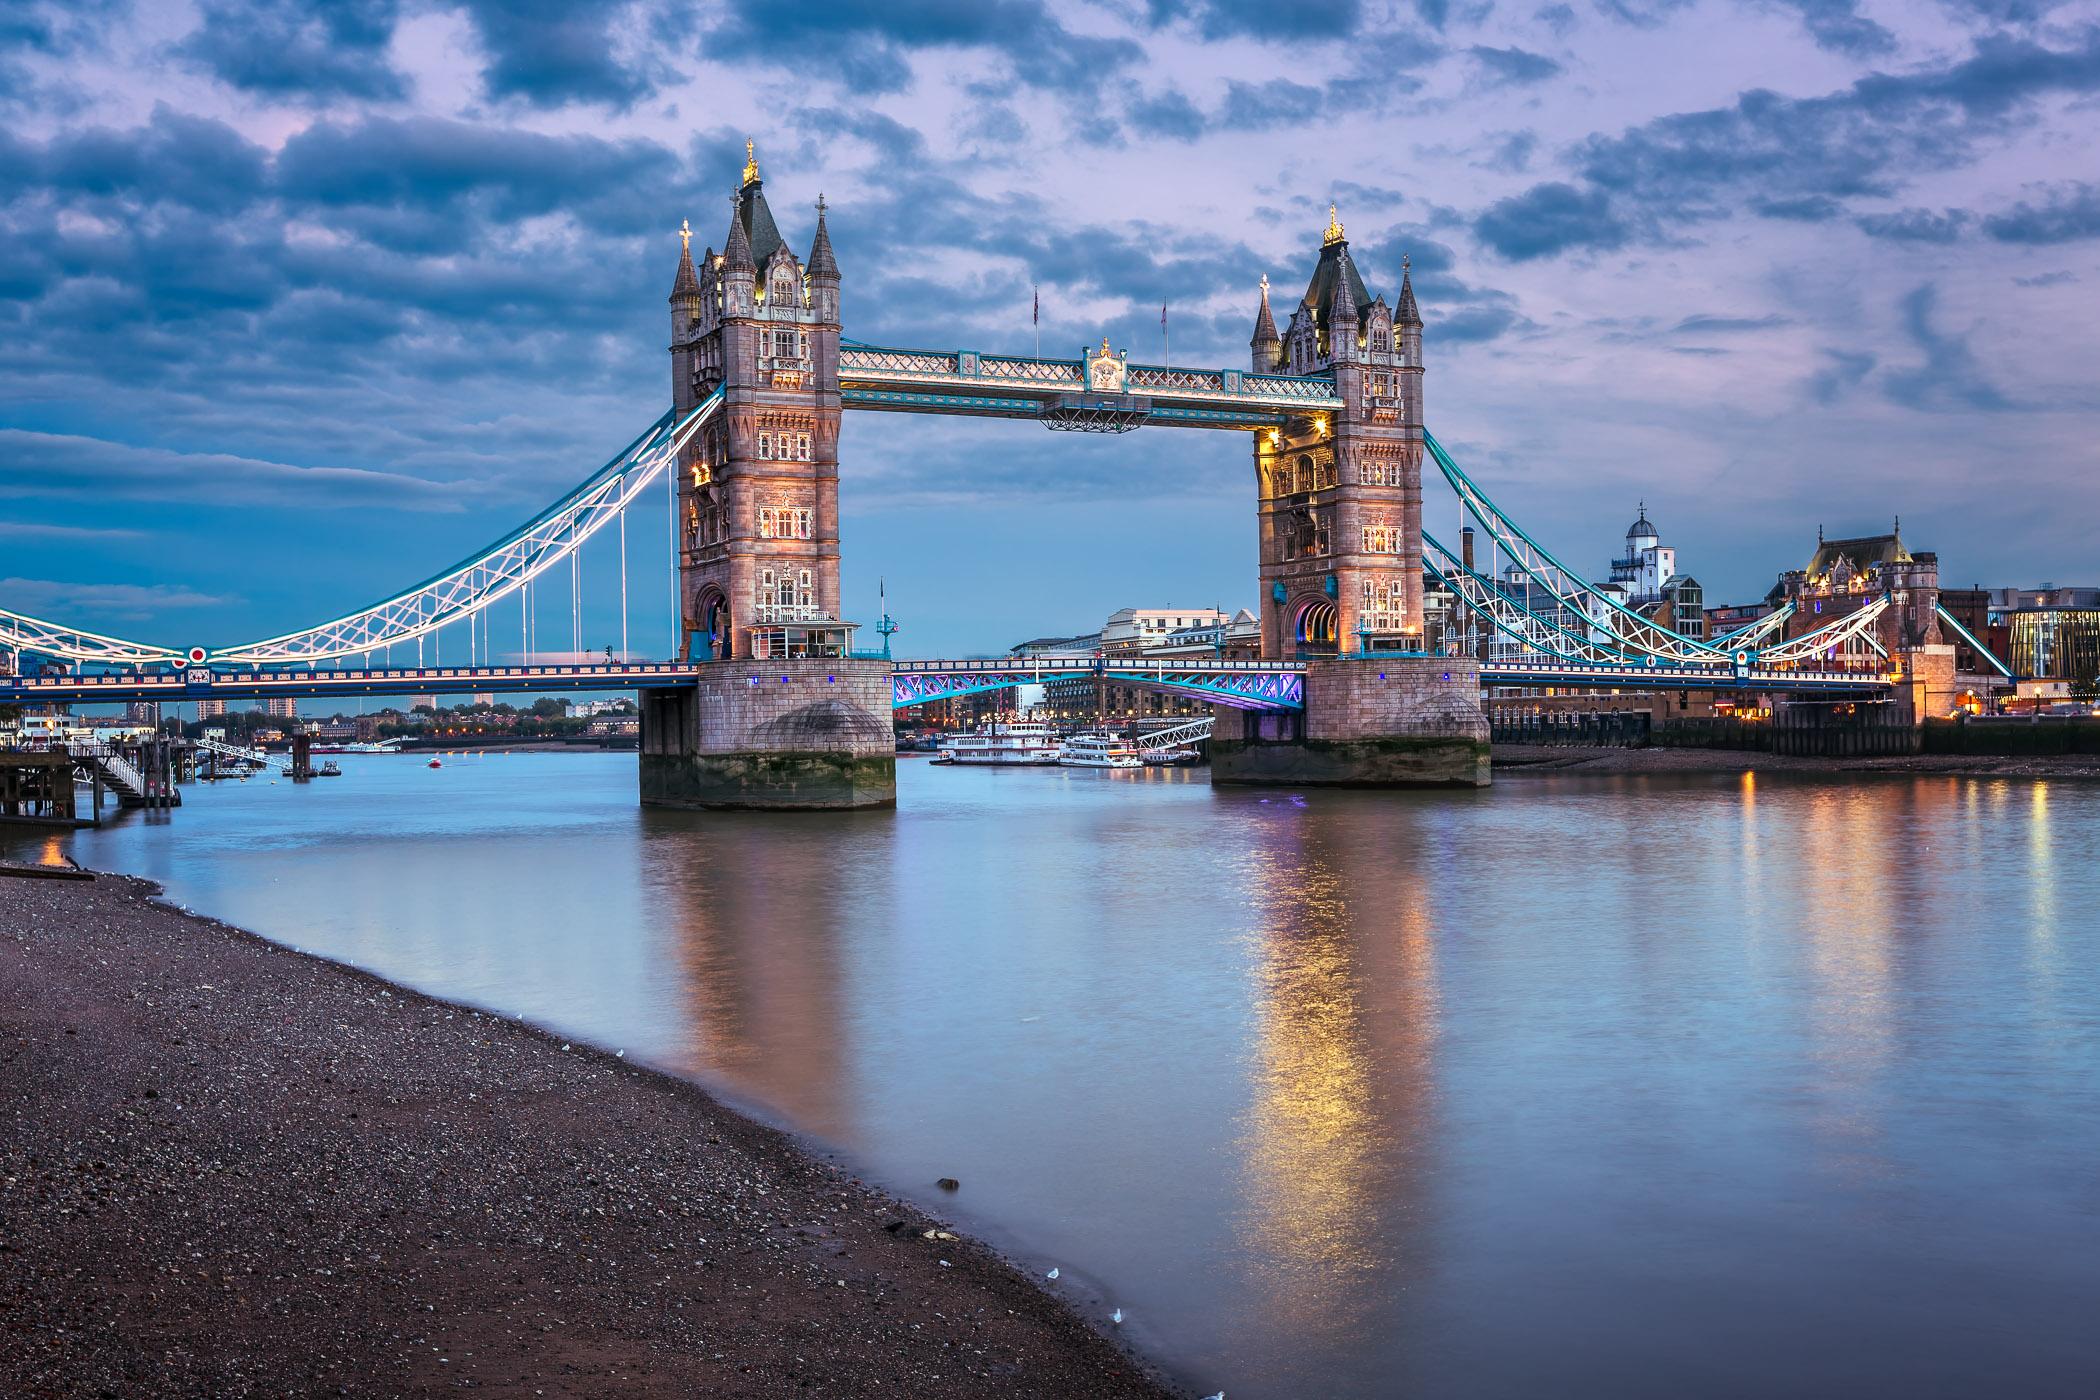 Famous Tower Bridge at Sunset, London, United Kingdom